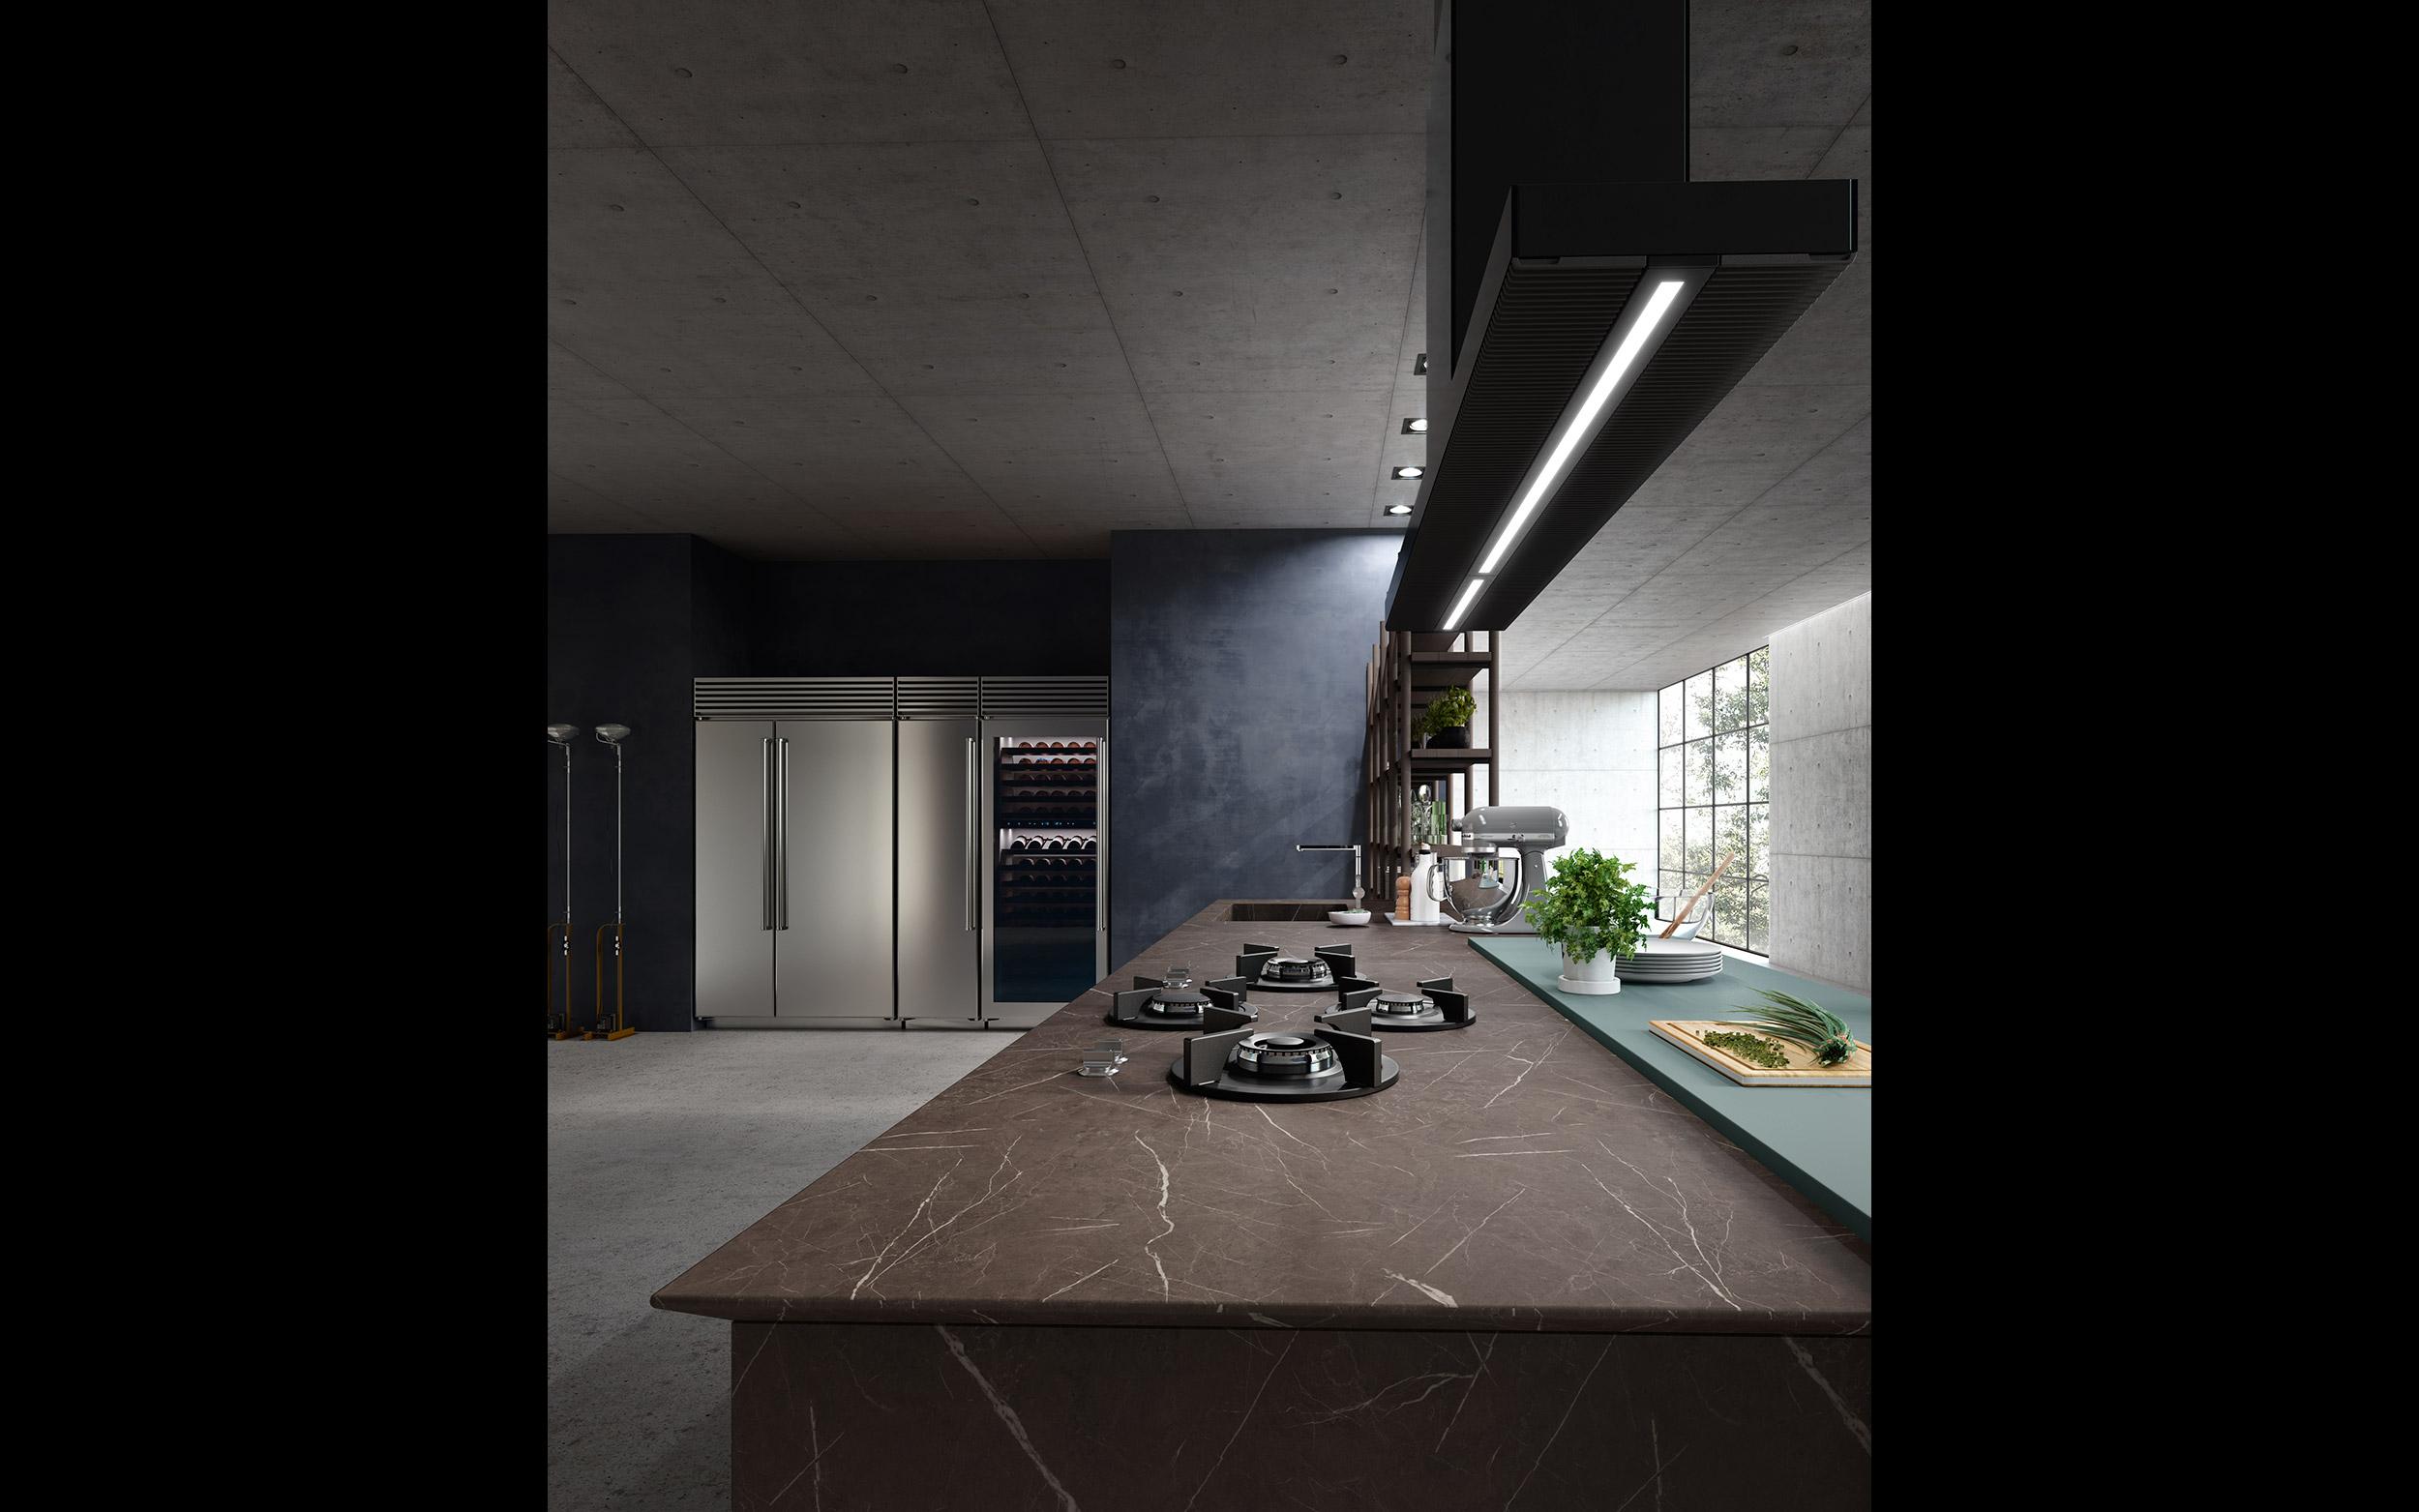 cucina di marmo